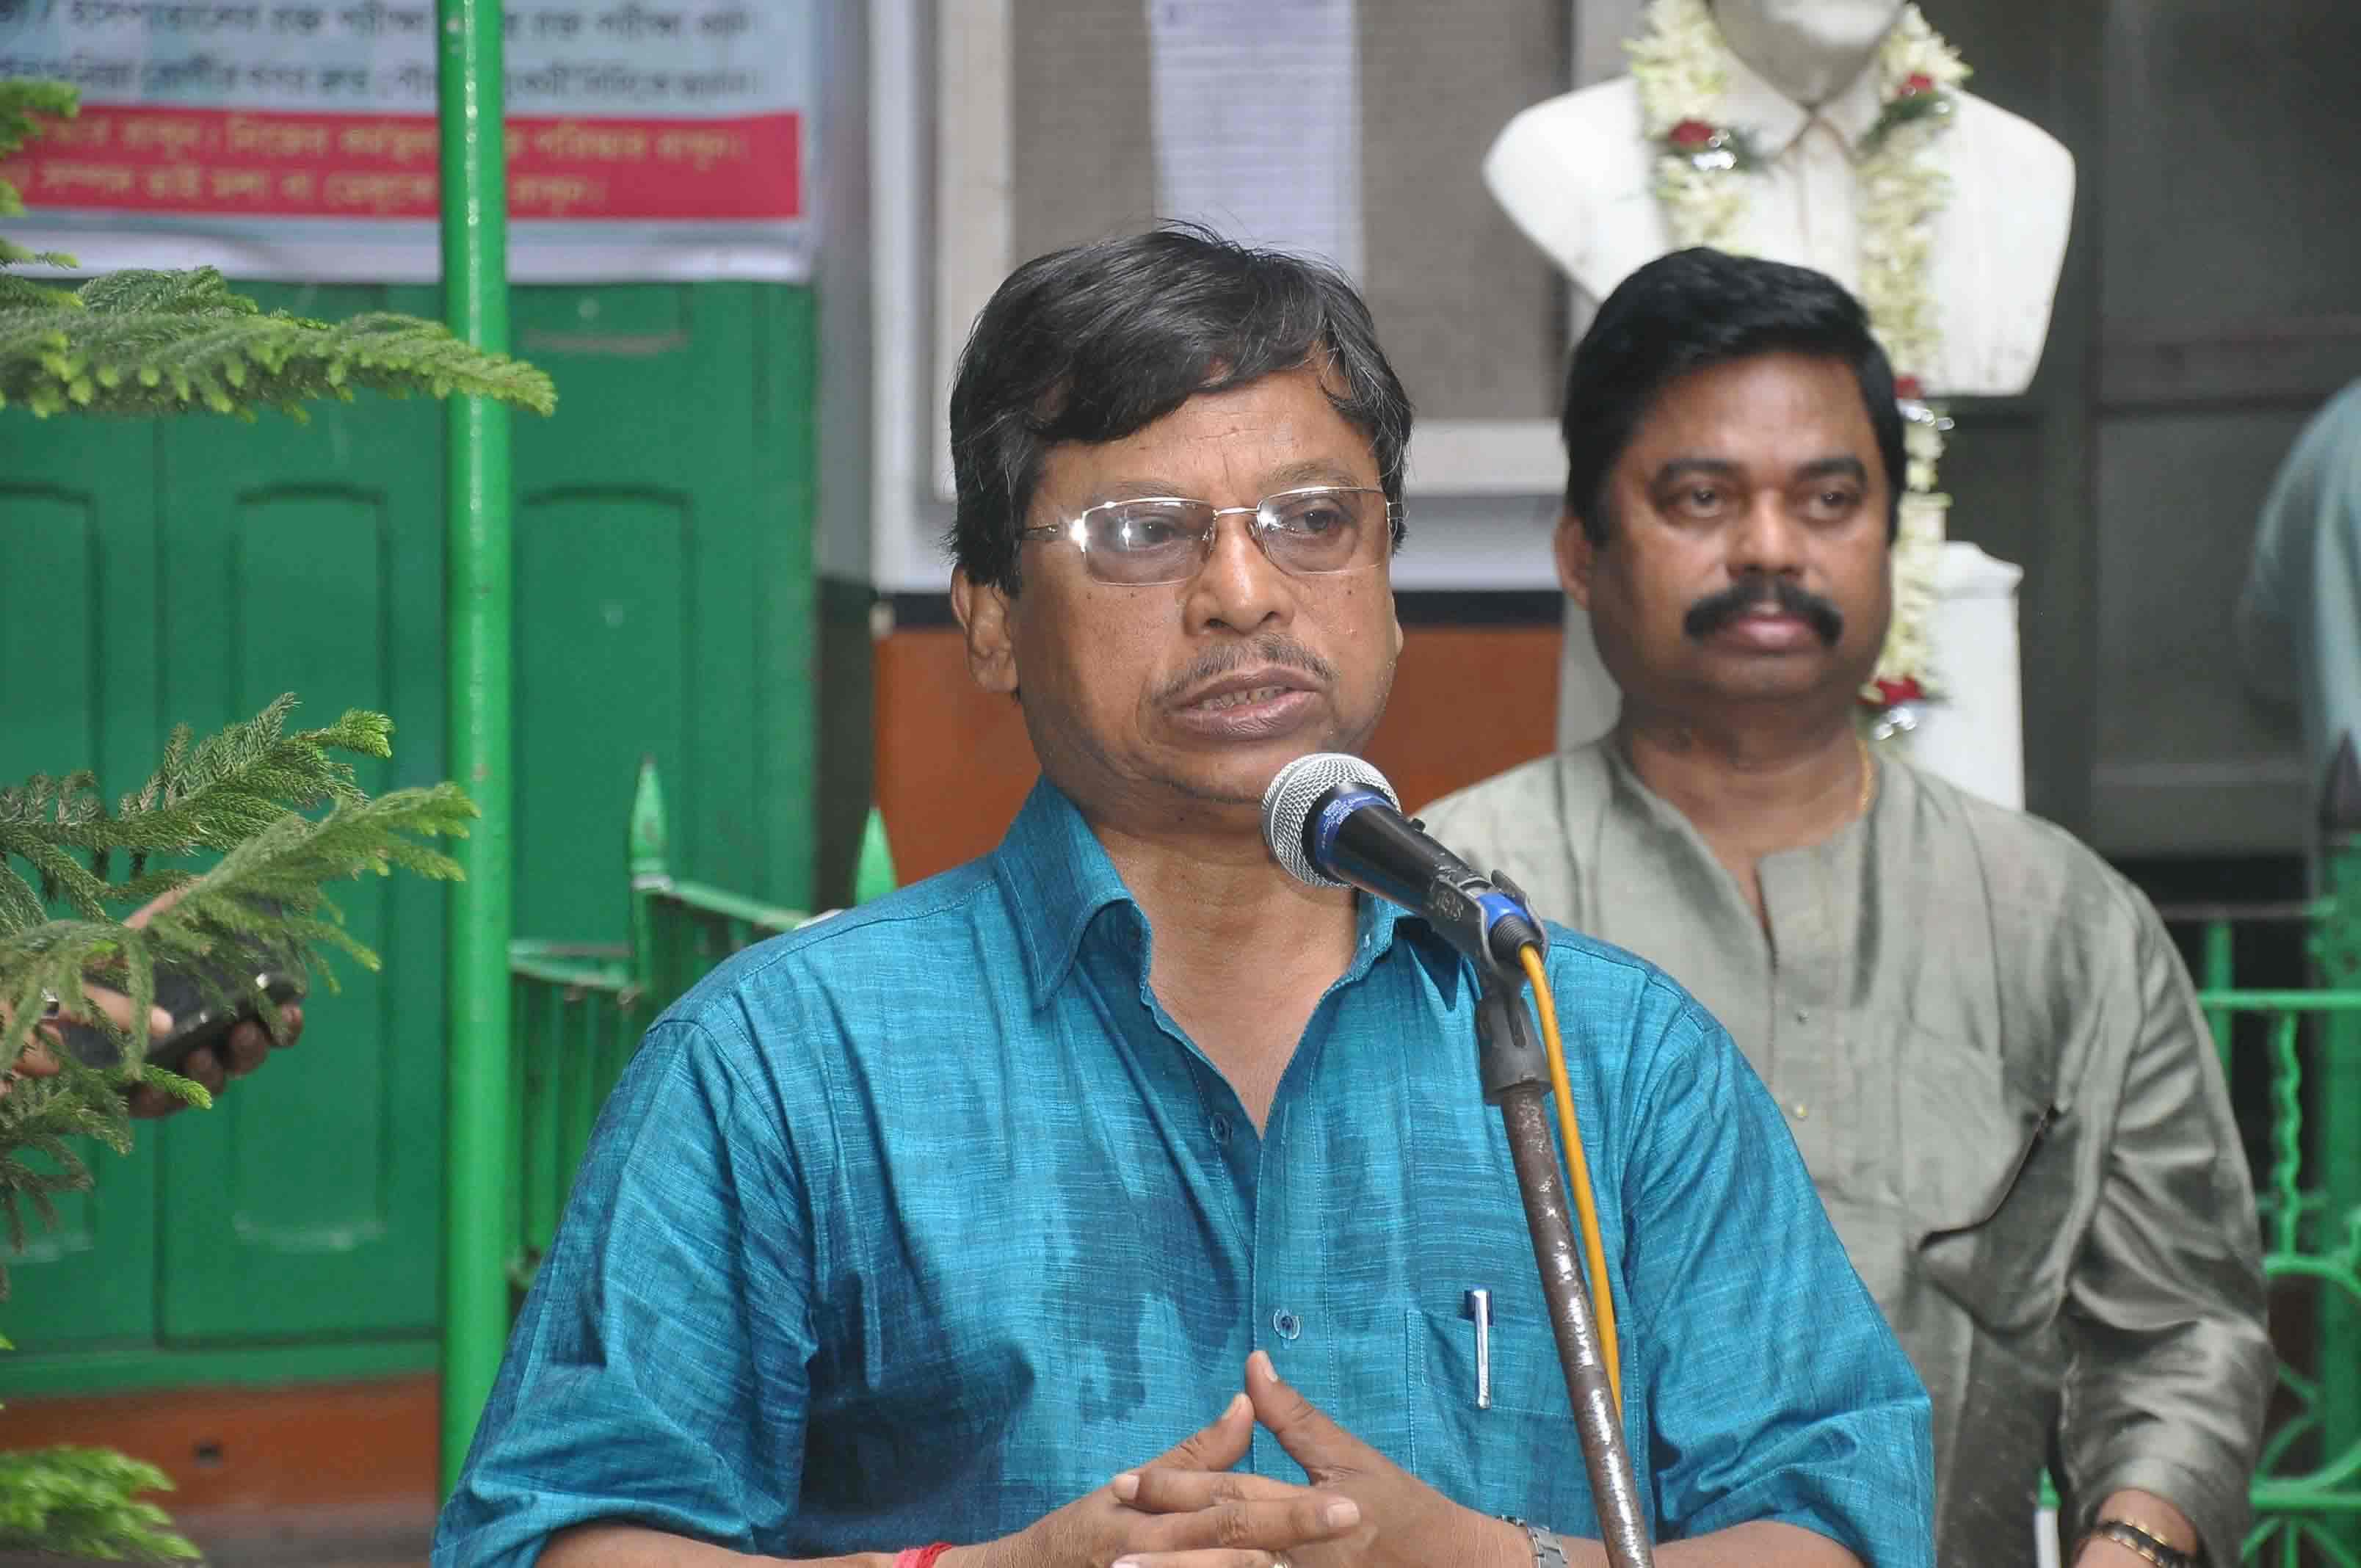 Speech-by-Sri-jahar-Lal-Das